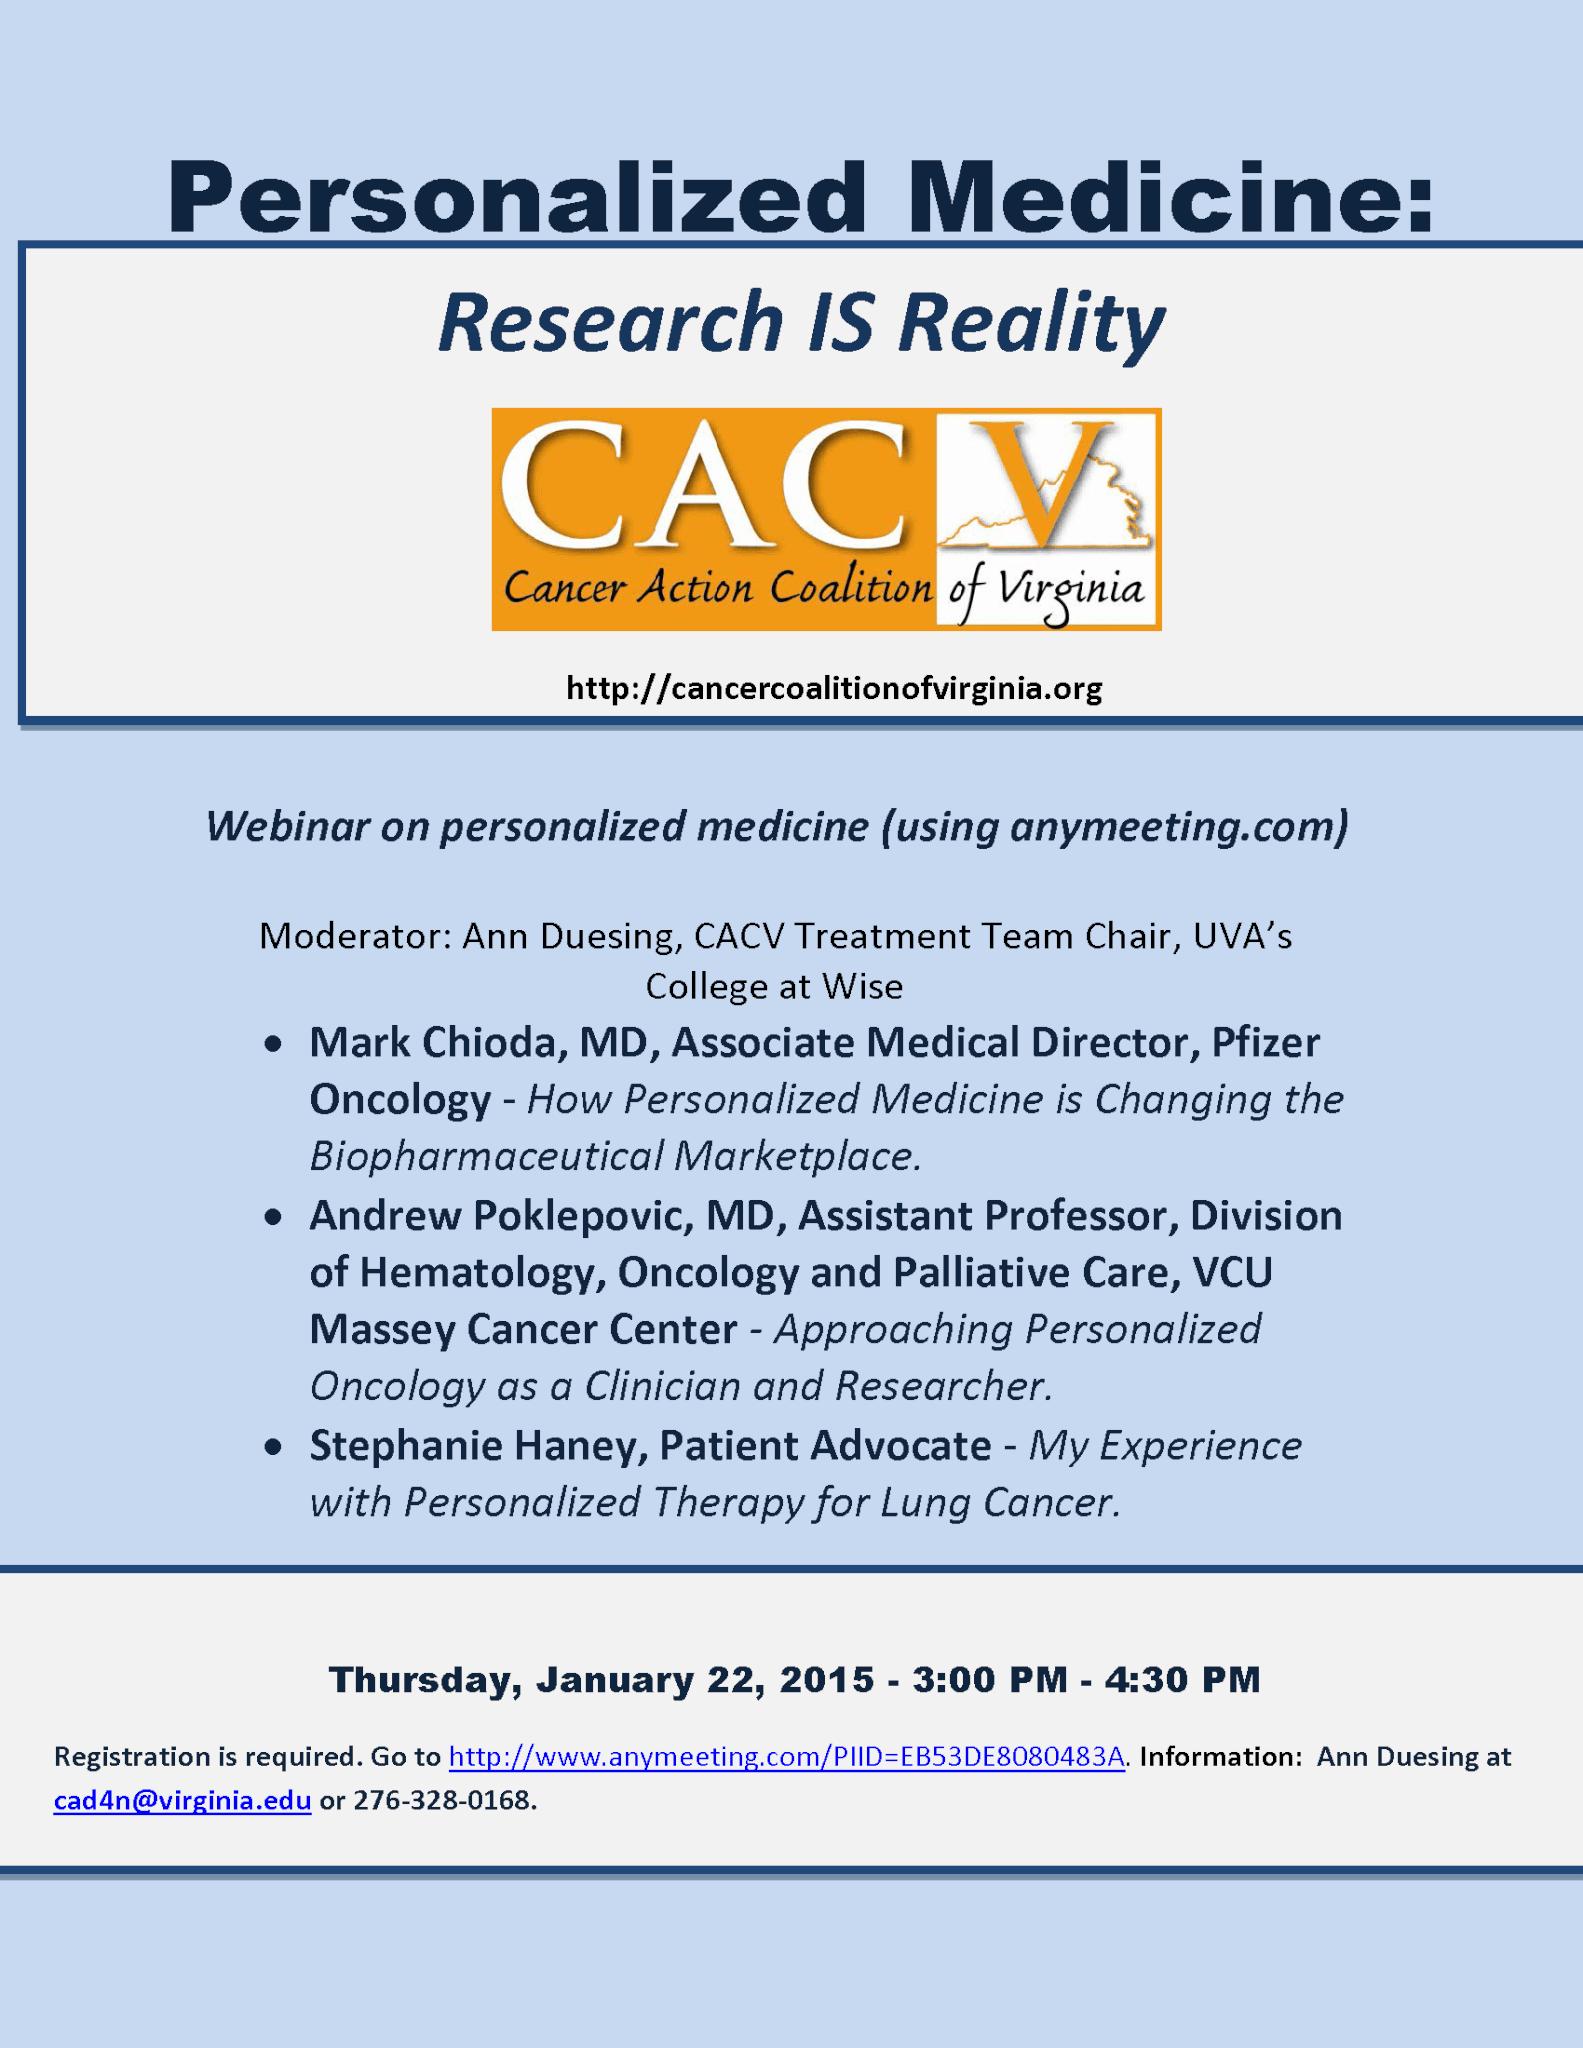 CACV Treatment Team Webinar flyer